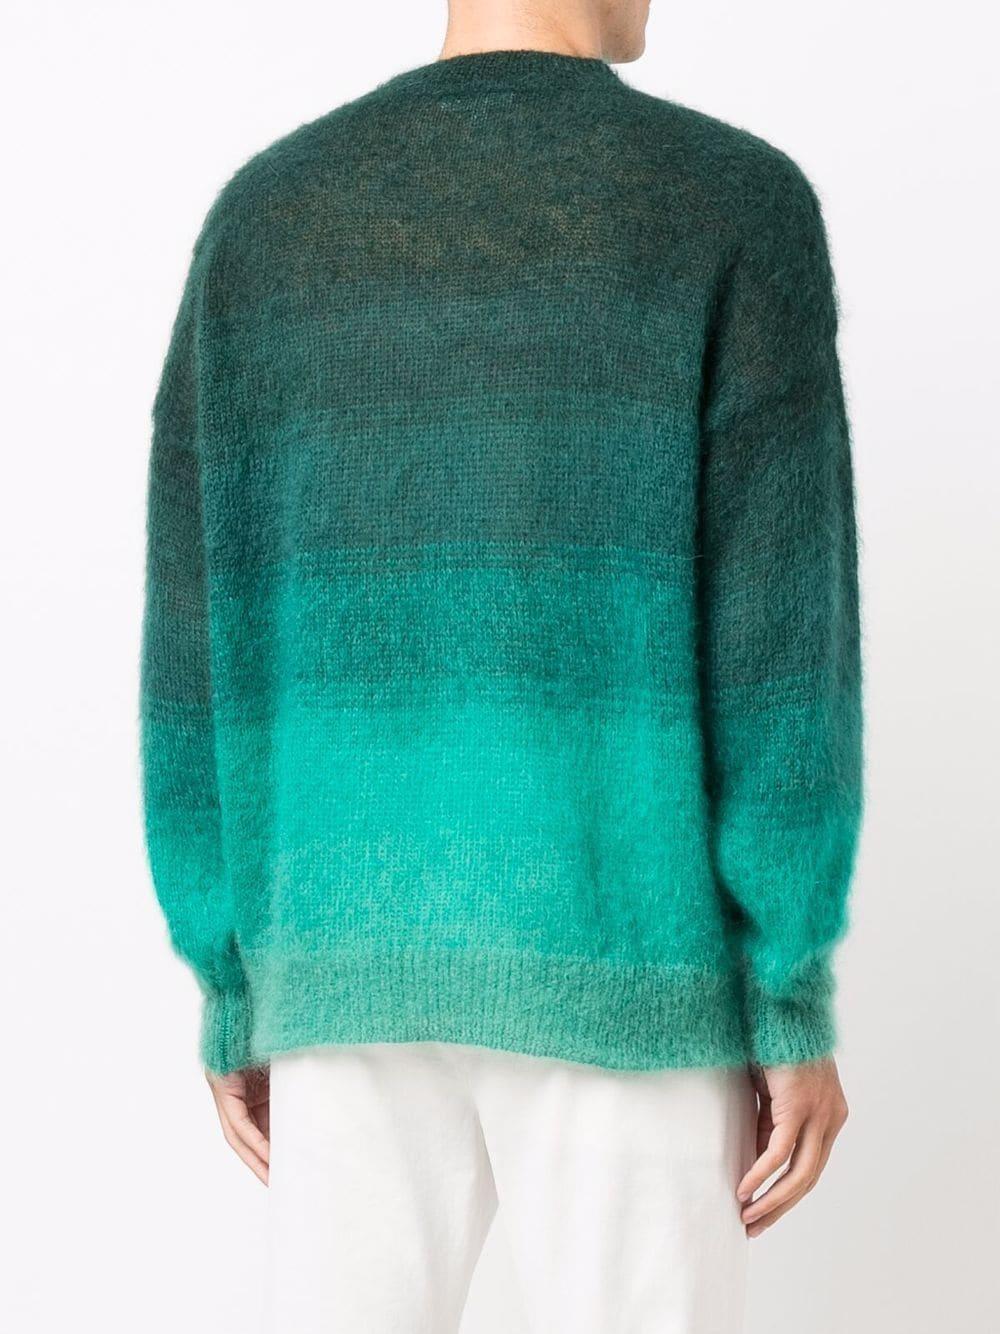 maglione drussellh uomo verde in lana ISABEL MARANT   Maglieria   21APU1275-21A054H67DG